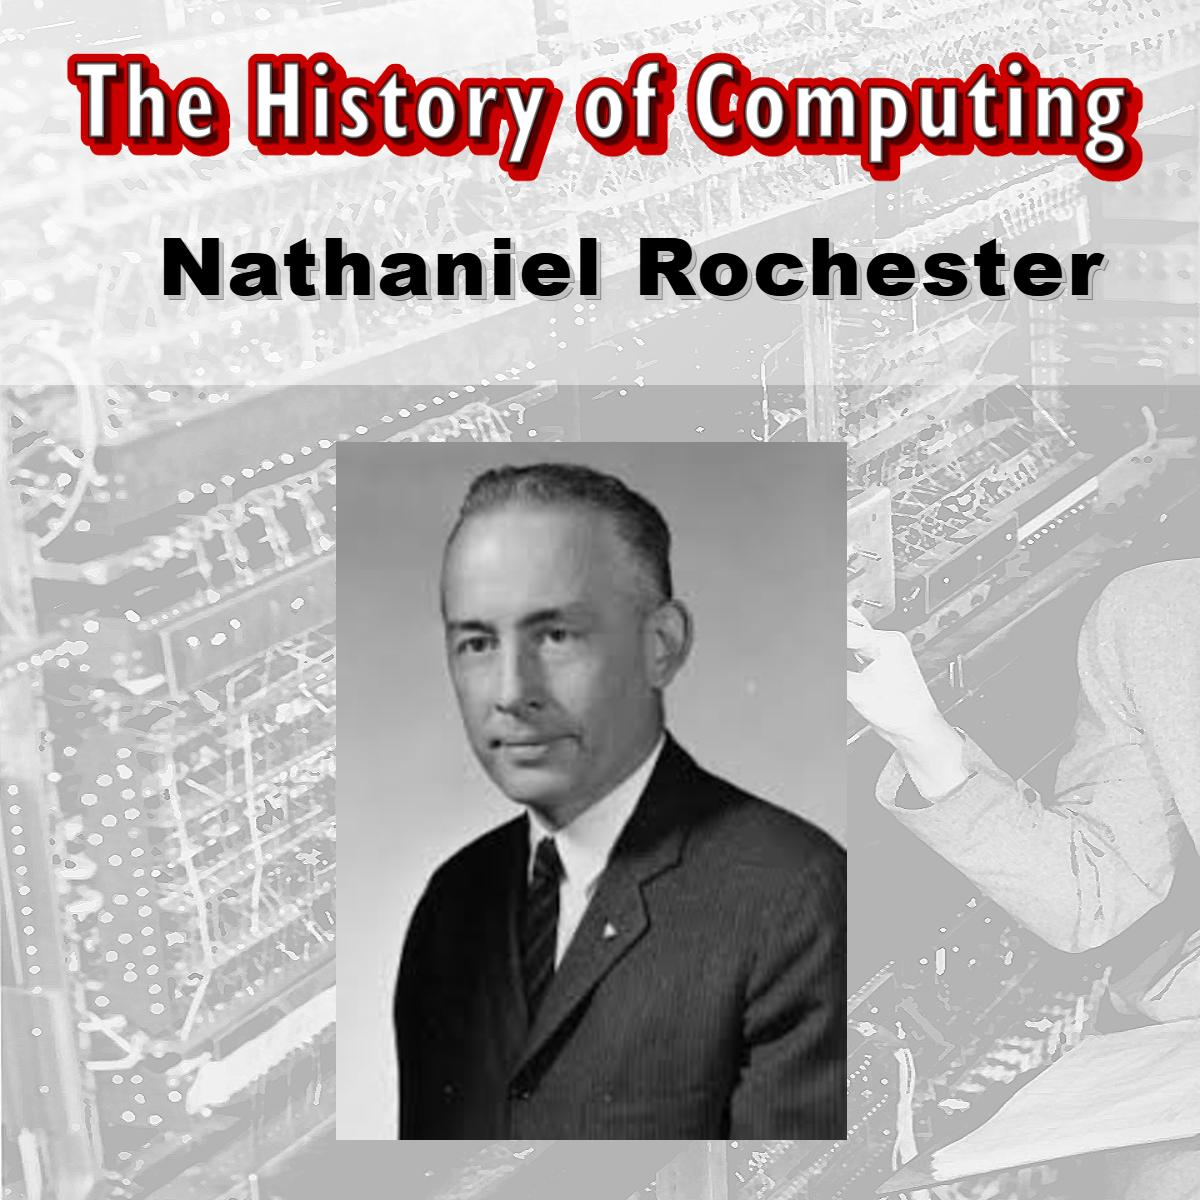 Nathaniel Rochester